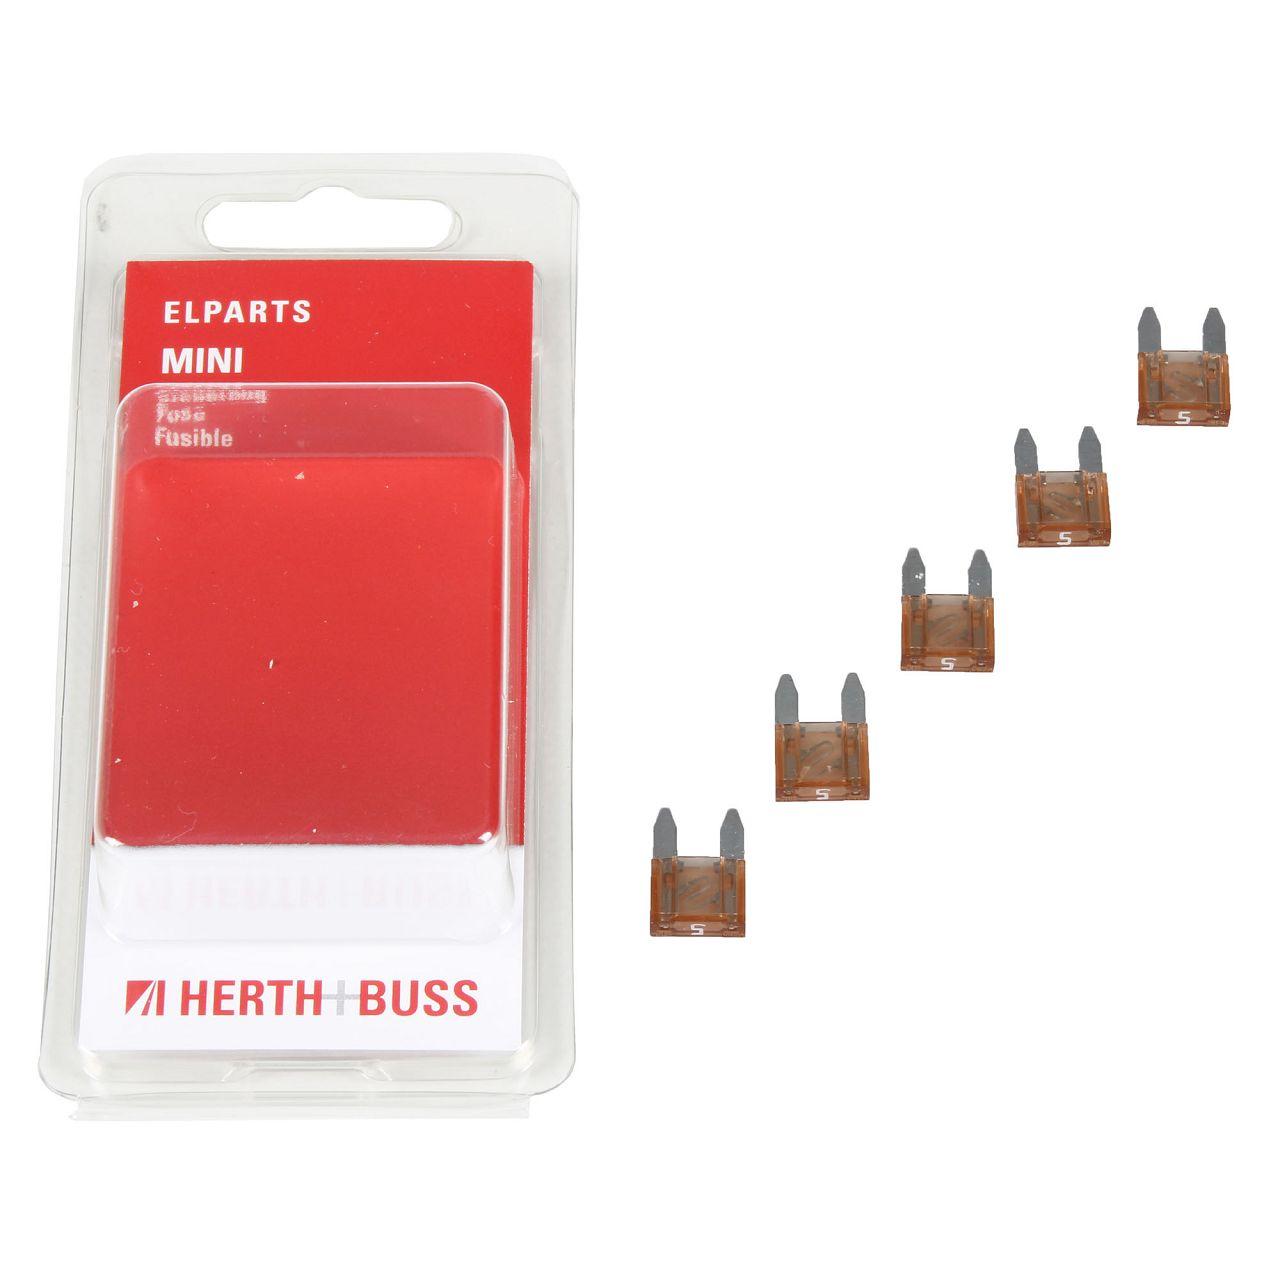 5x HERTH+BUSS Auto KFZ Sicherung Stecksicherung Flachsicherung HELLBRAUN 5A MINI